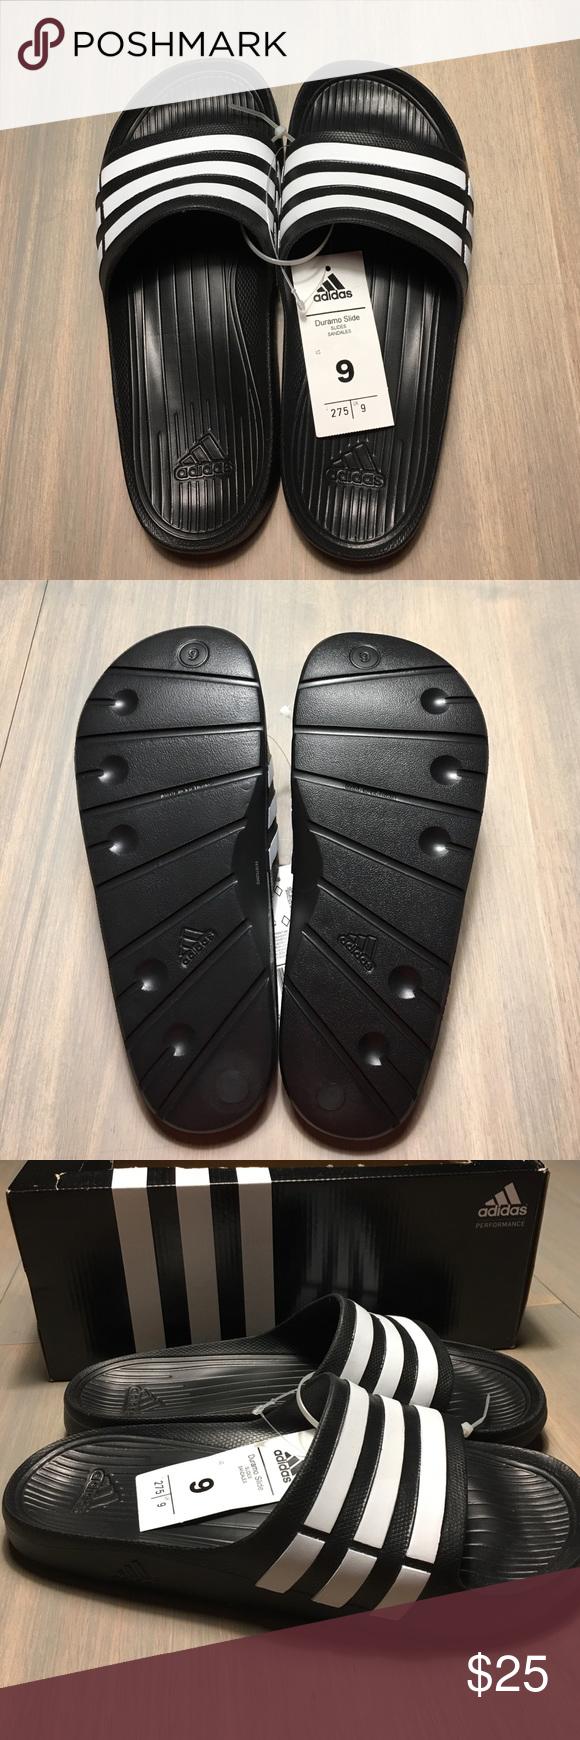 bca3c8979a74 Adidas Duramo Slides - Size 9 - NIB Comfortable slides in black white  stripes.